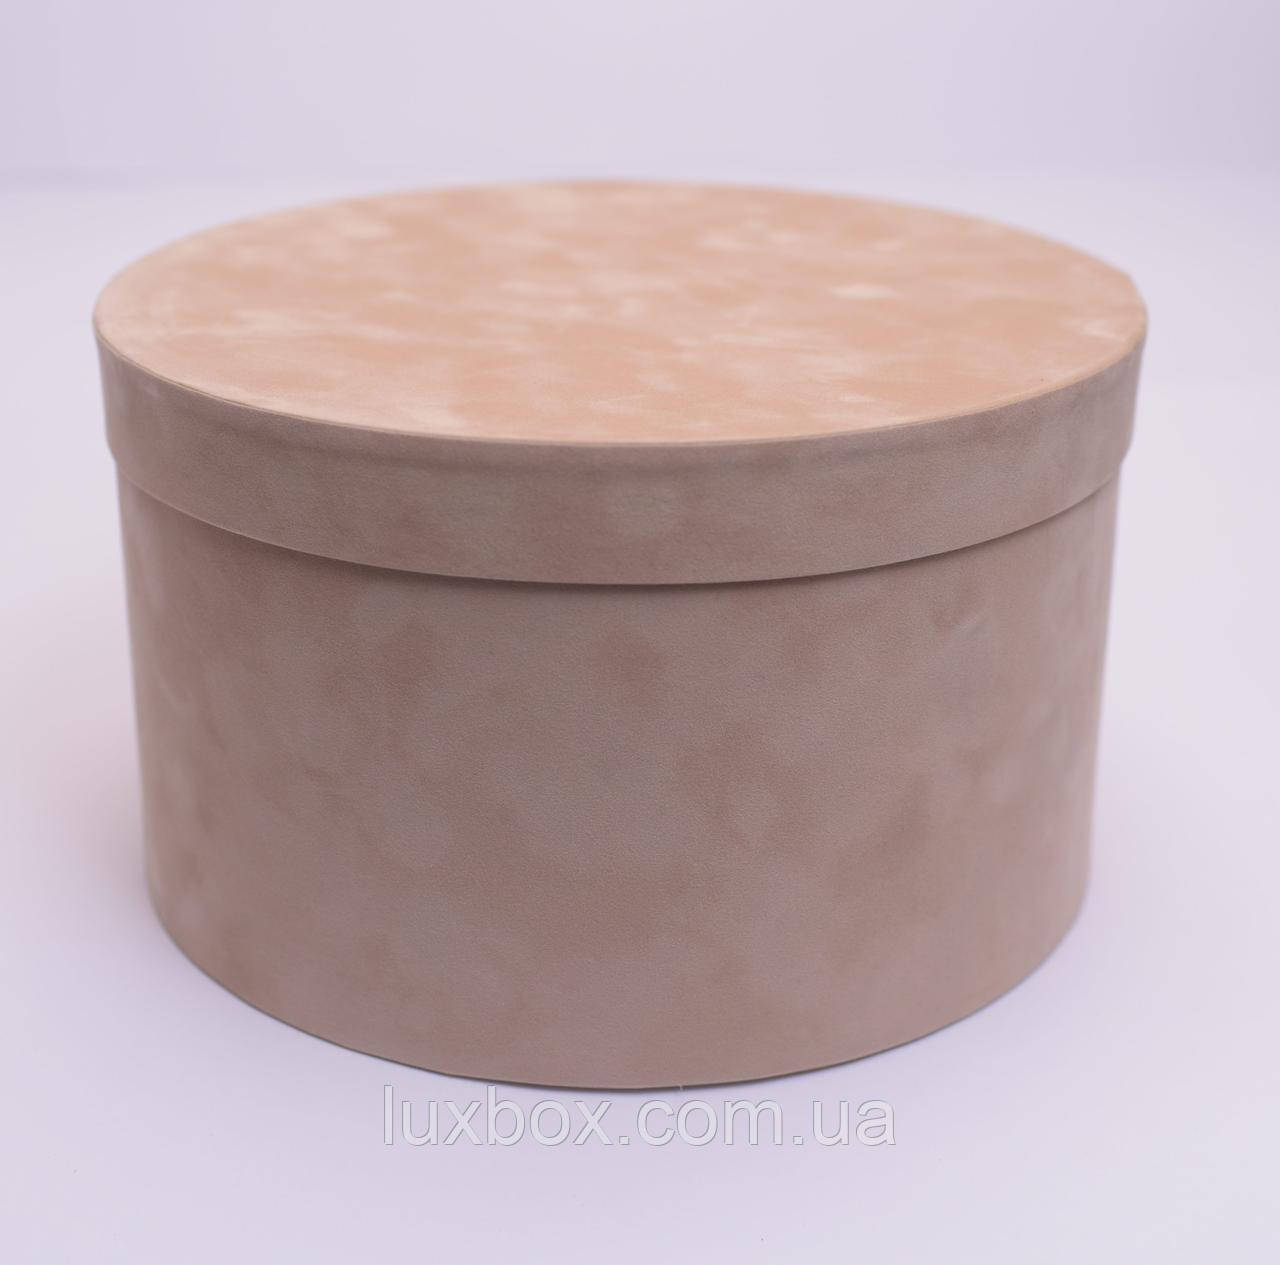 Шляпна коробка Велюрова(бархатна коробка) h15/d25